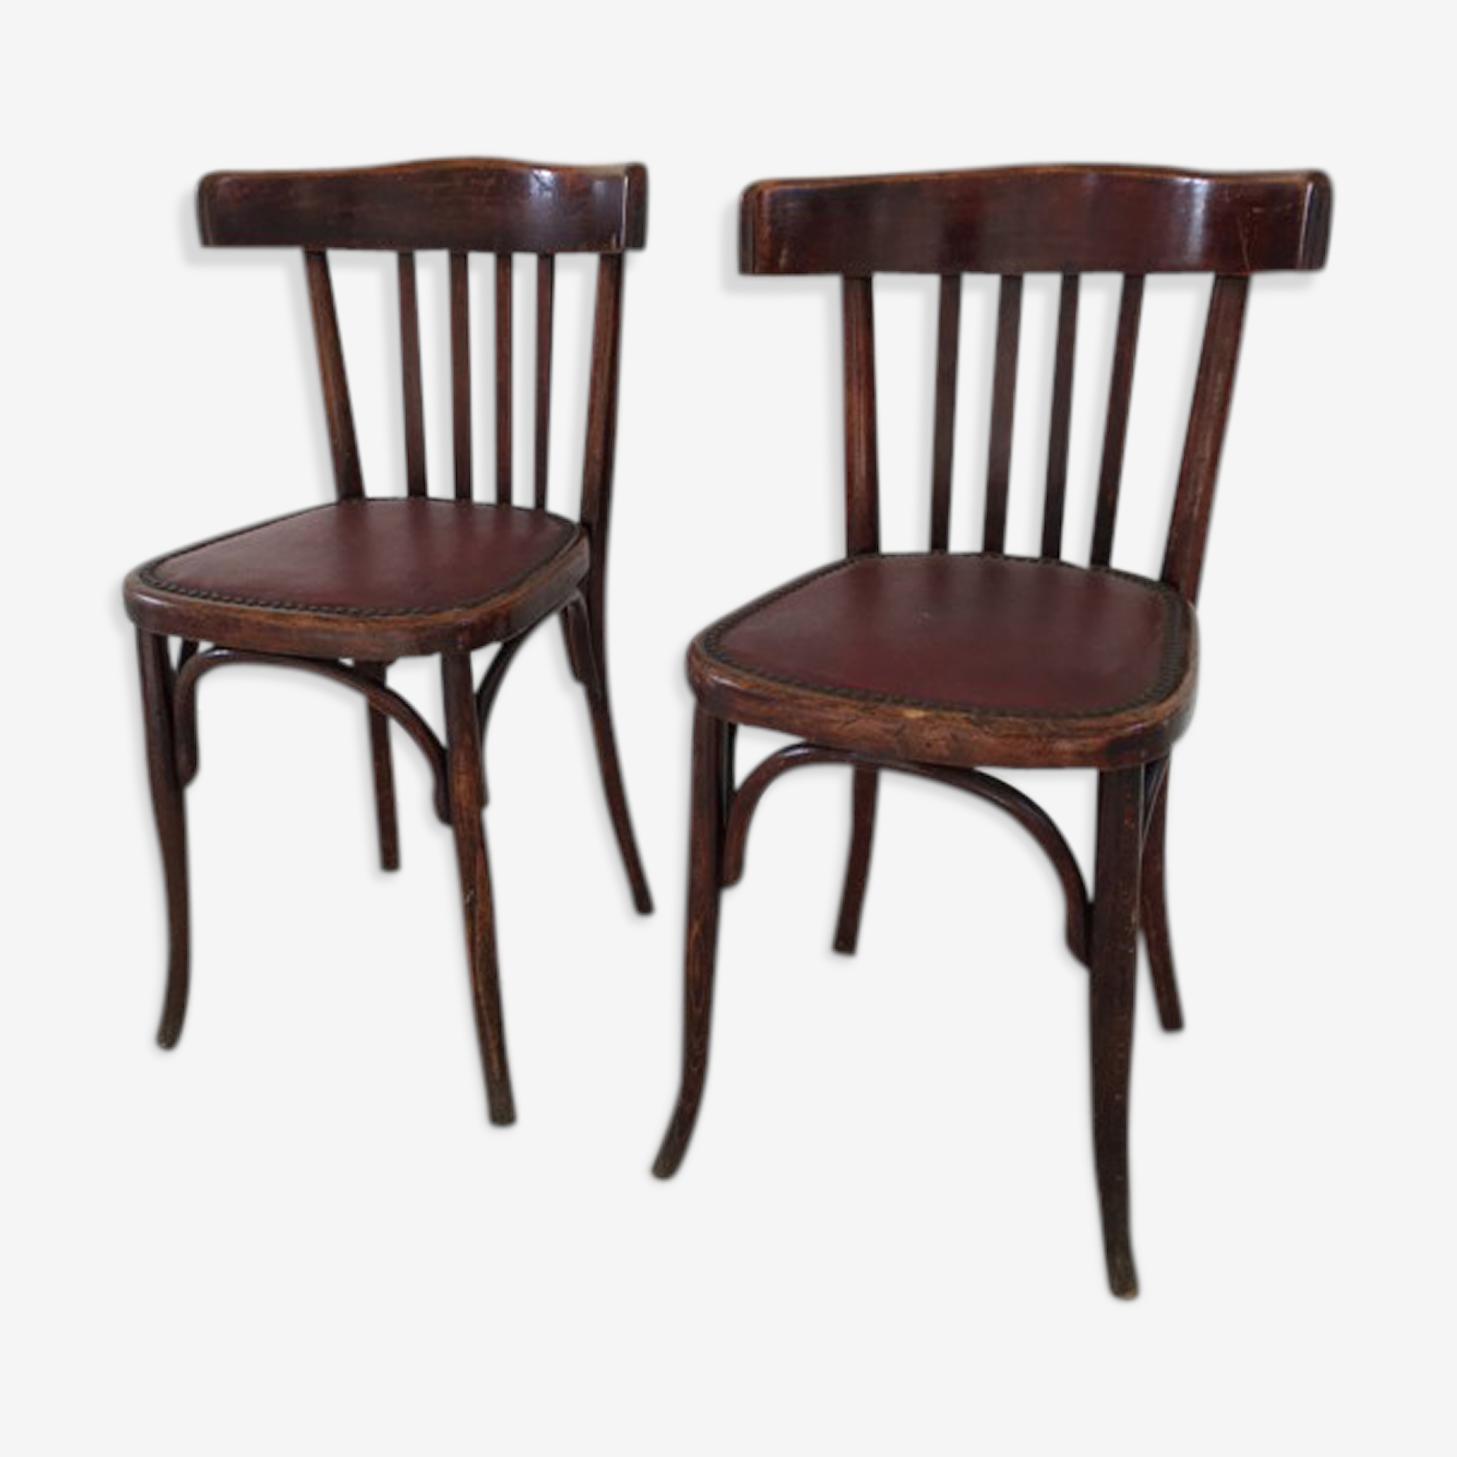 2 chaises bistrot Fischel 1900-1920